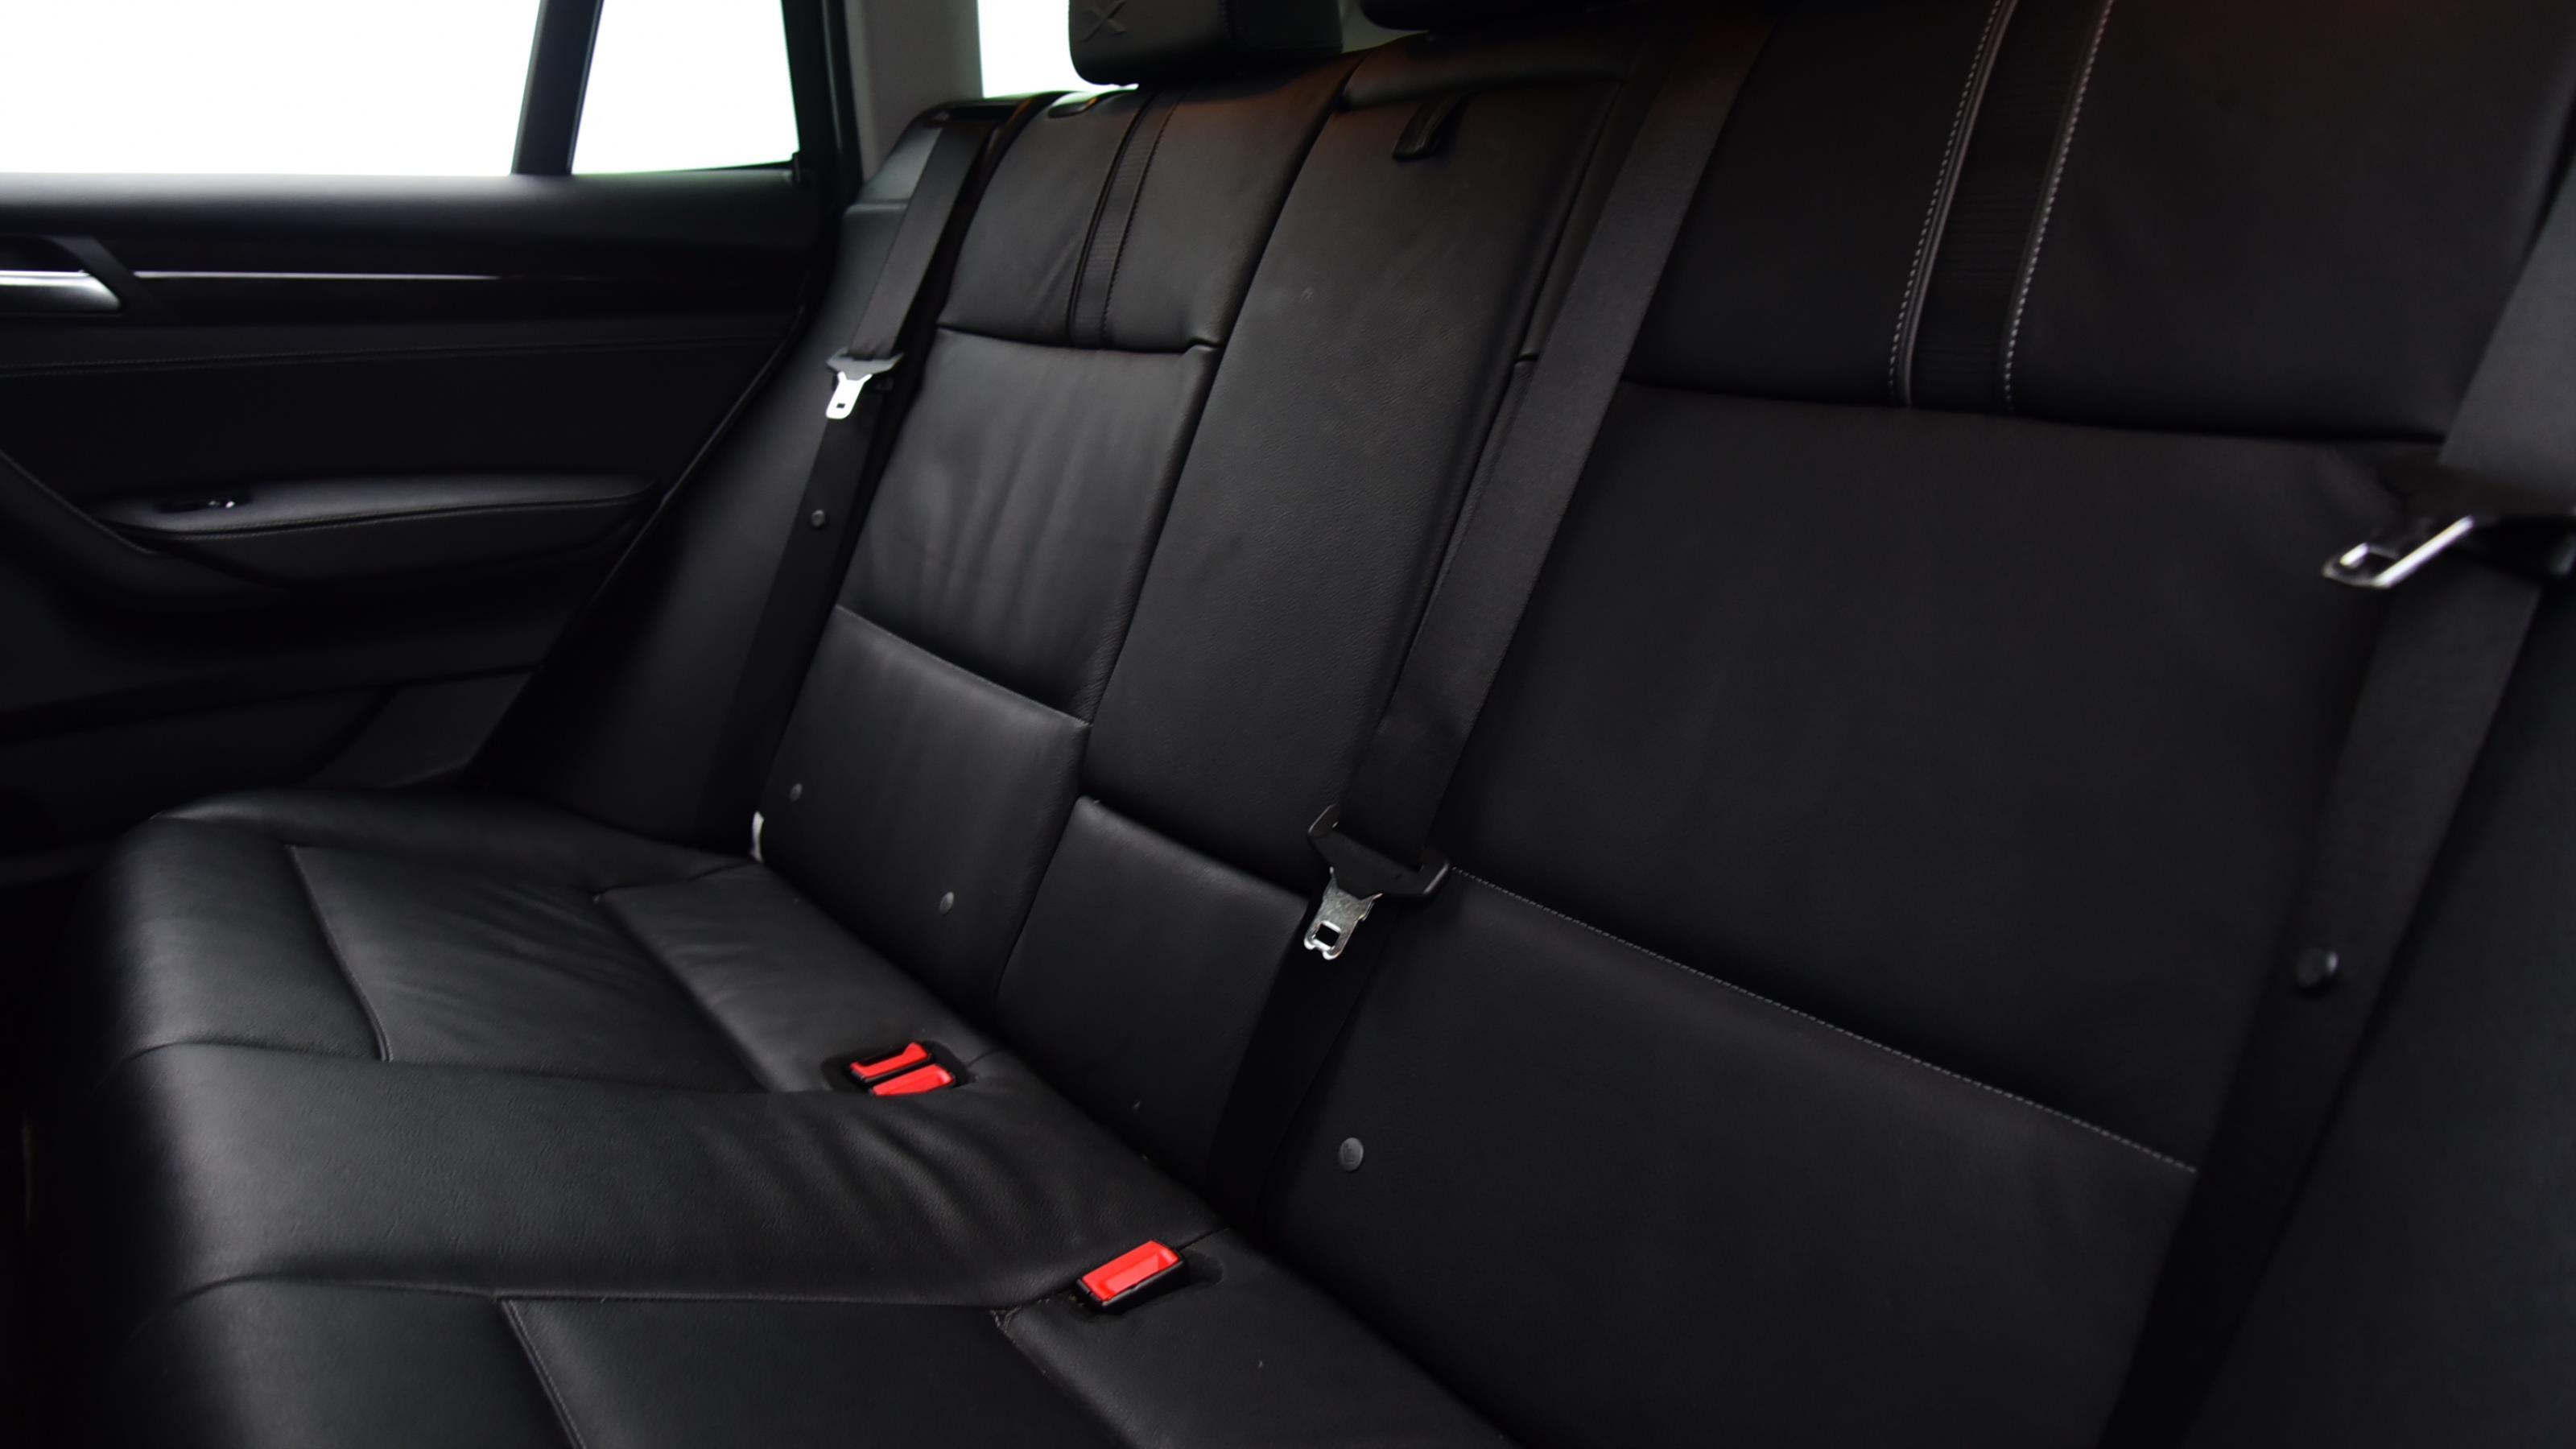 Used 14 BMW X3 xDrive30d xLine 5dr Step Auto GREY at Saxton4x4